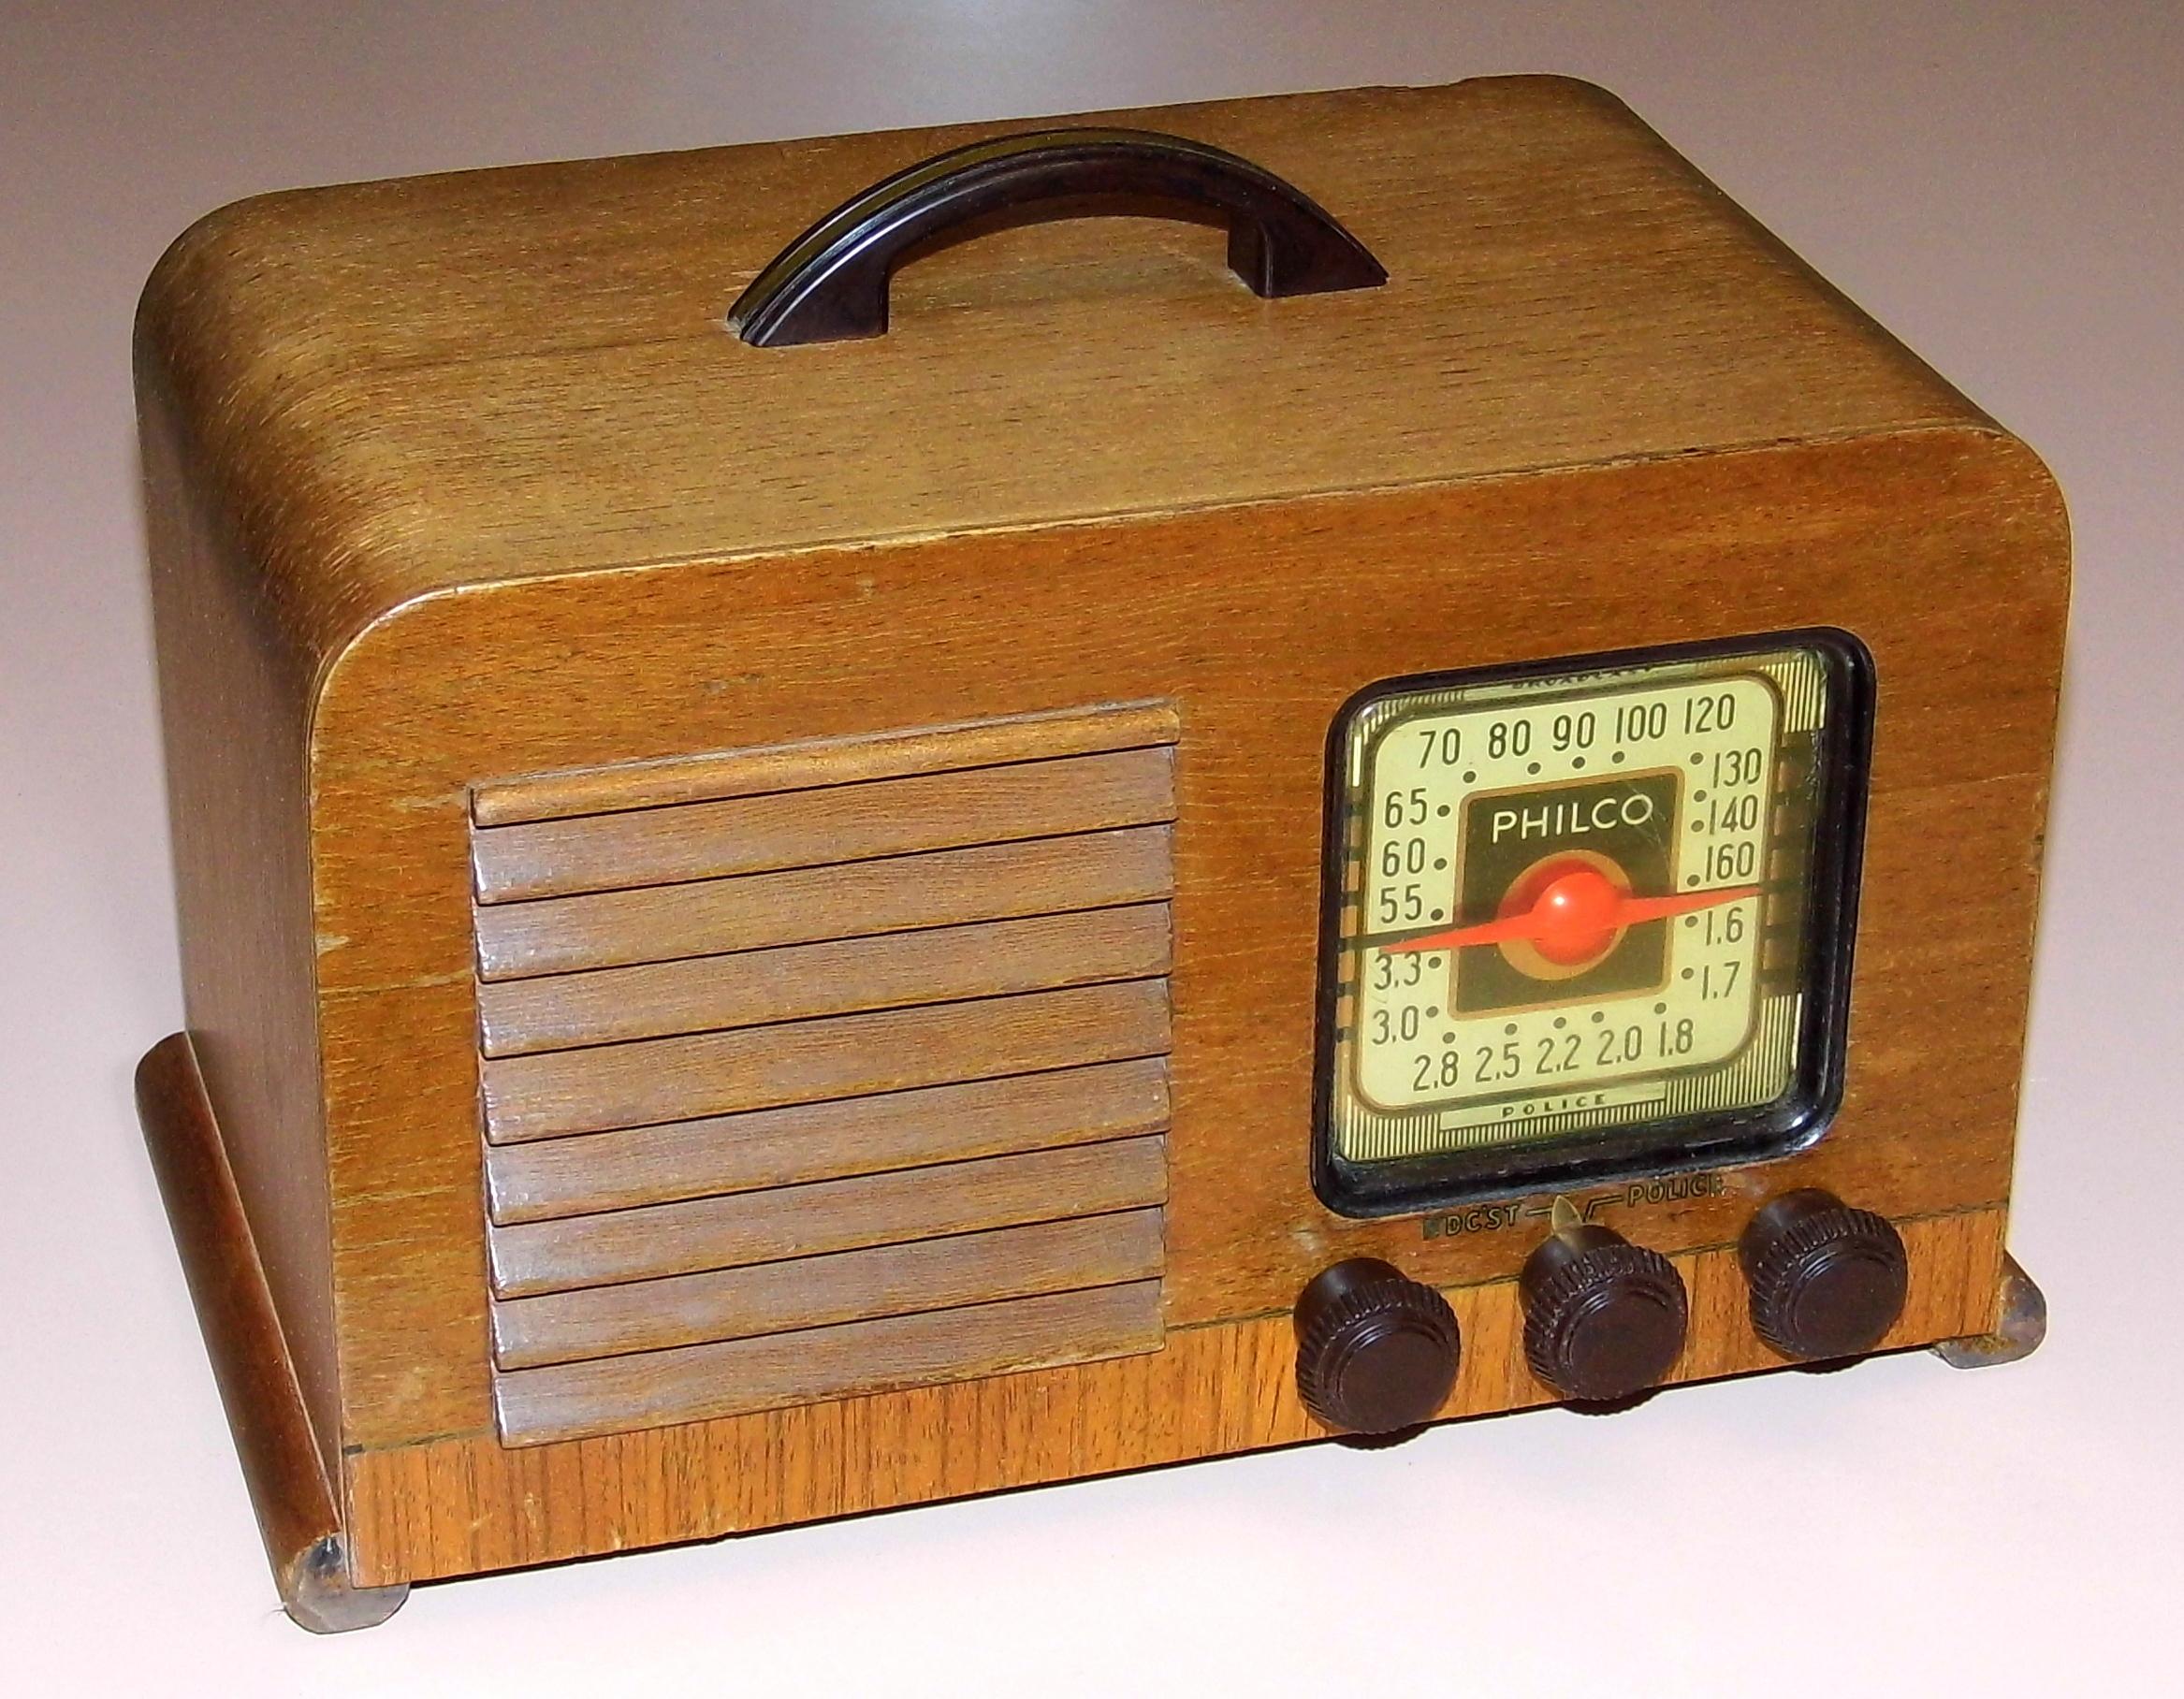 Vintage Philco Model 40 180. 3917f Floor Wood Console Es Service Manuals Schematics Using Swivel Tube Concept American Pany Released. Wiring. Zenith Tube Radio Schematics 10g 130 At Scoala.co